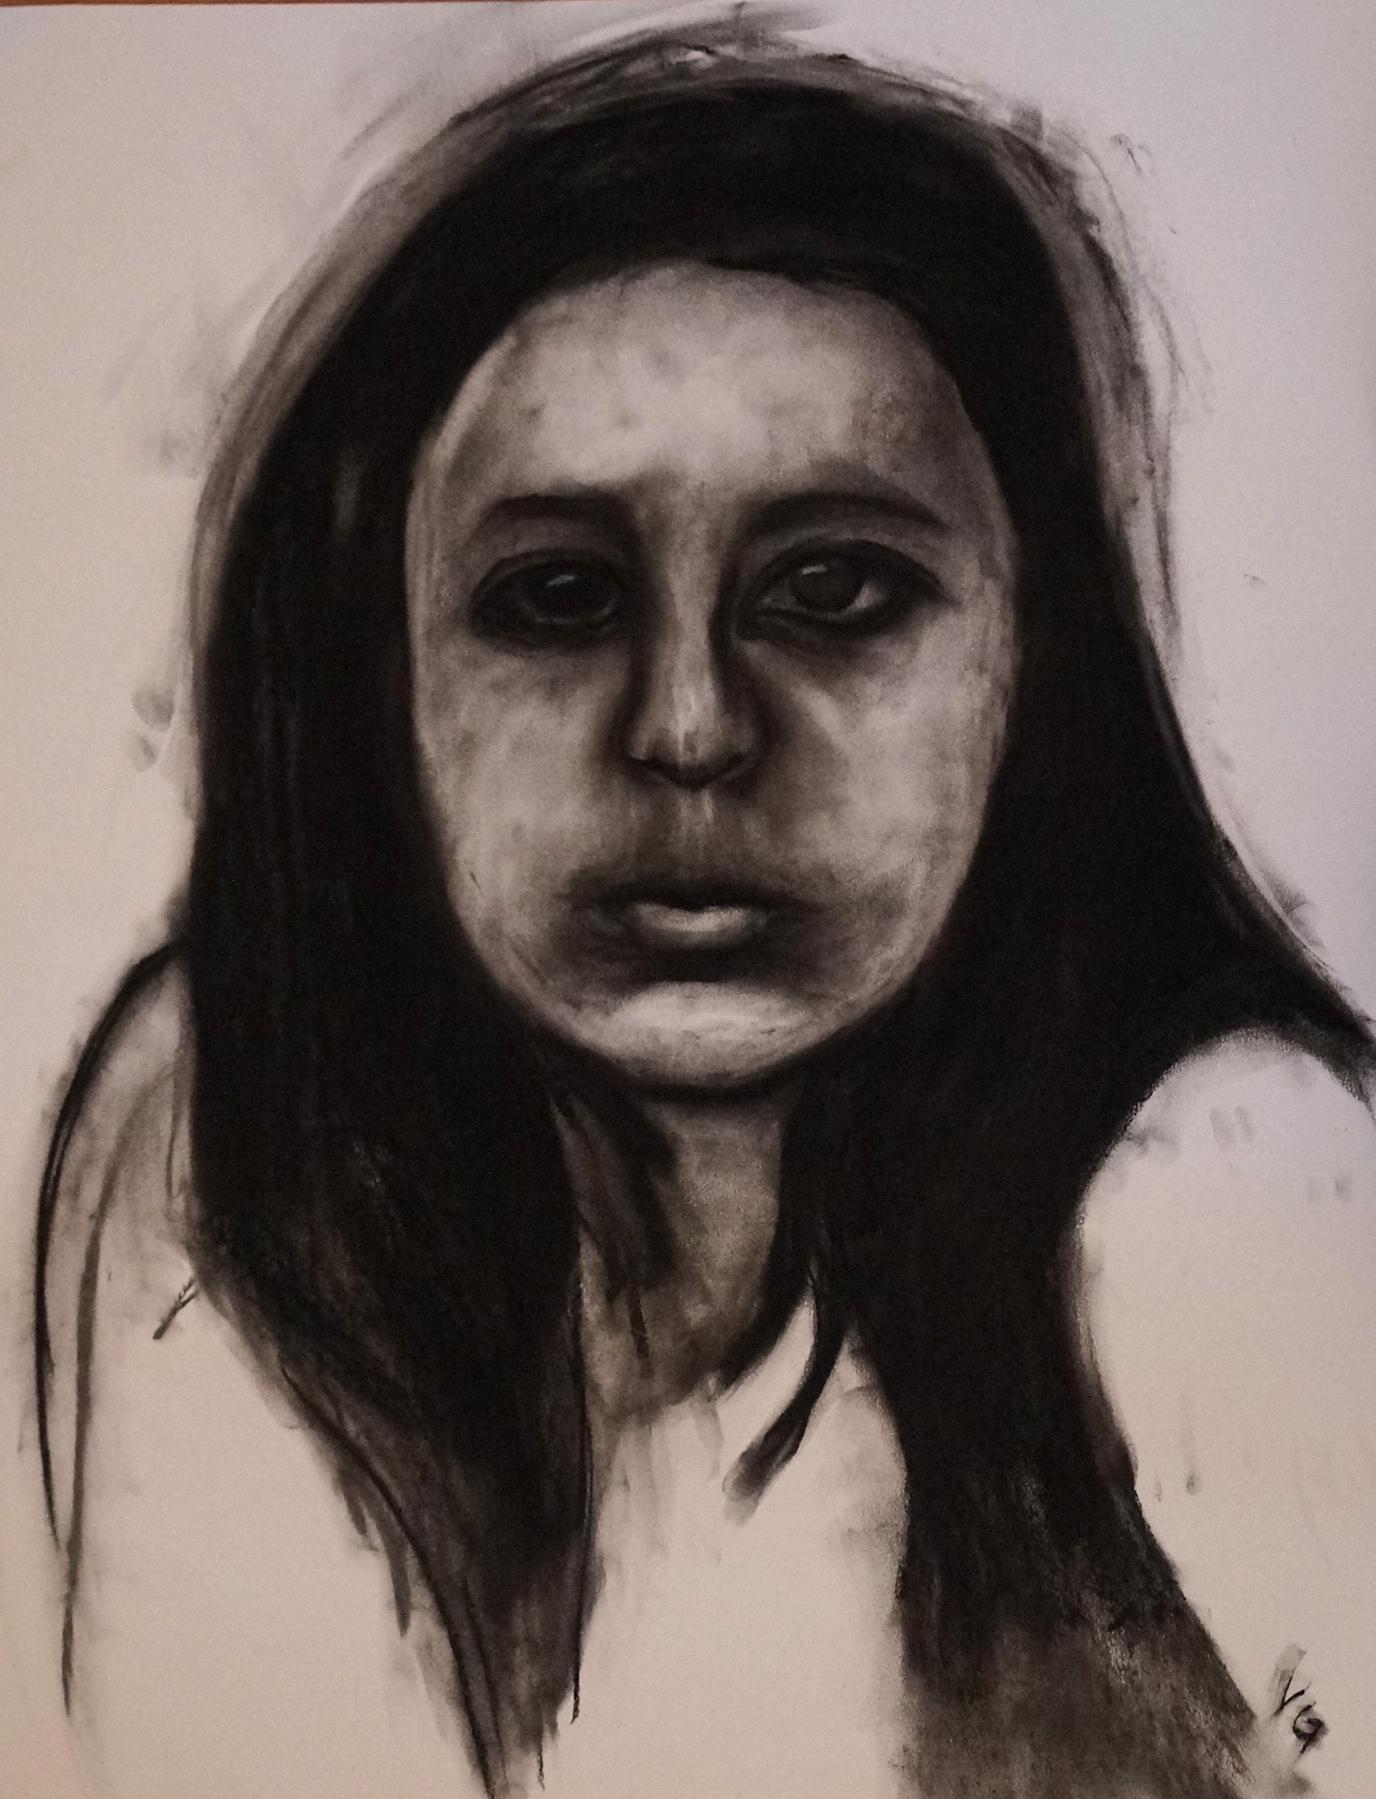 Self-Portrait #26